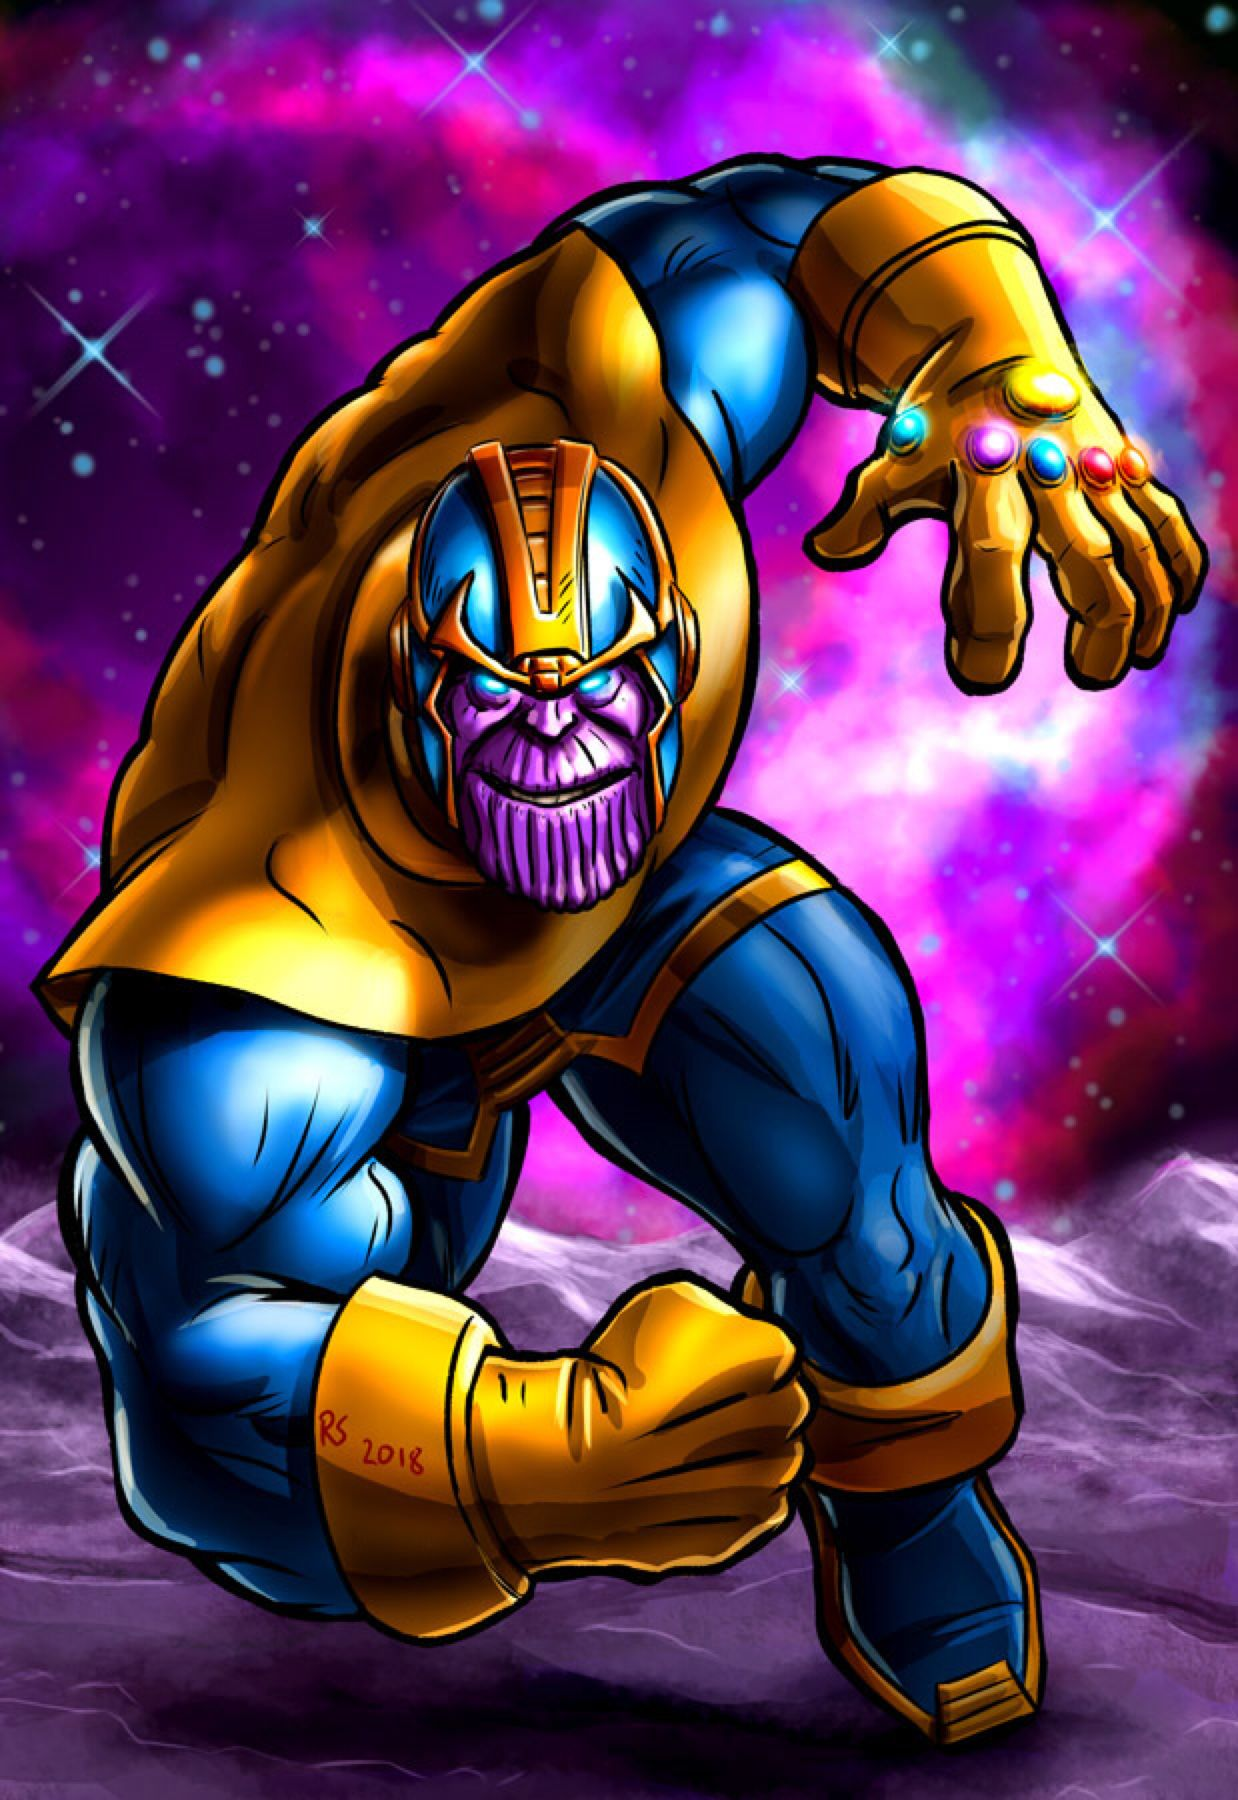 Marvel S Thanos By Robert Shane On Deviantart Marvel Thanos Marvel Mundo Marvel